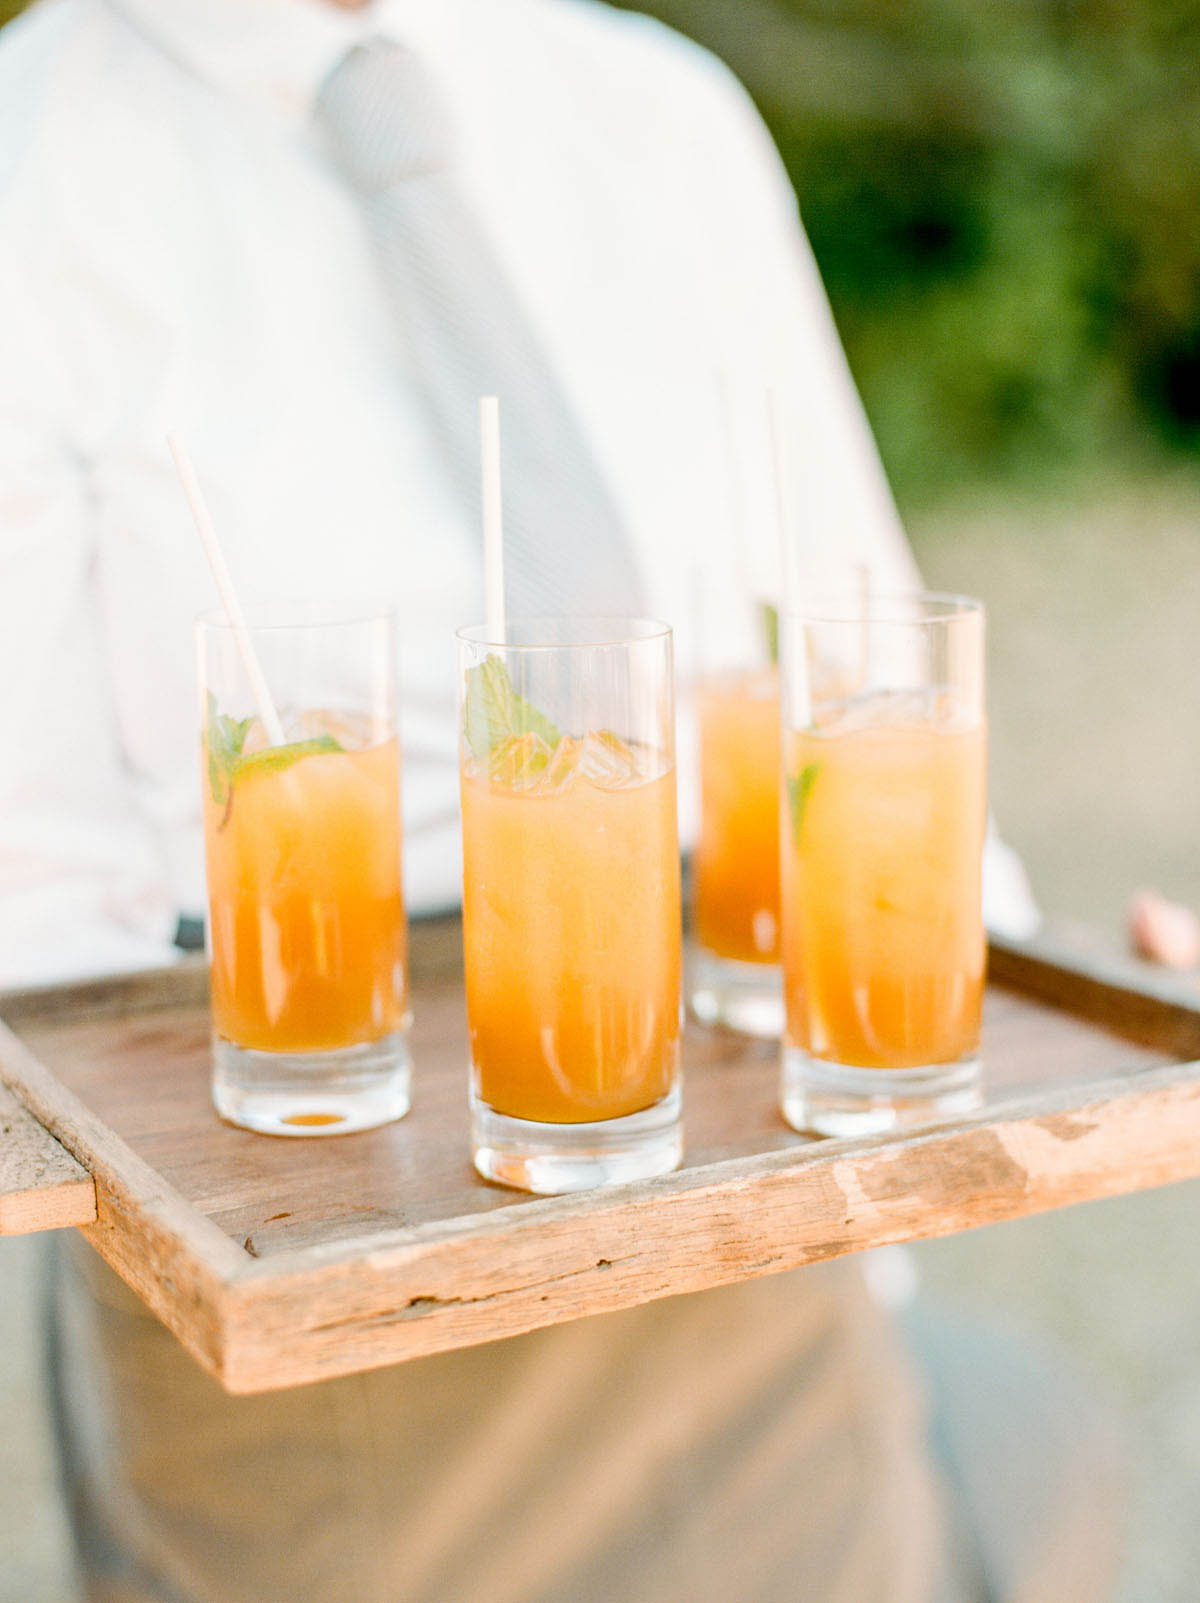 22-paula-leduc-cocktails.jpg